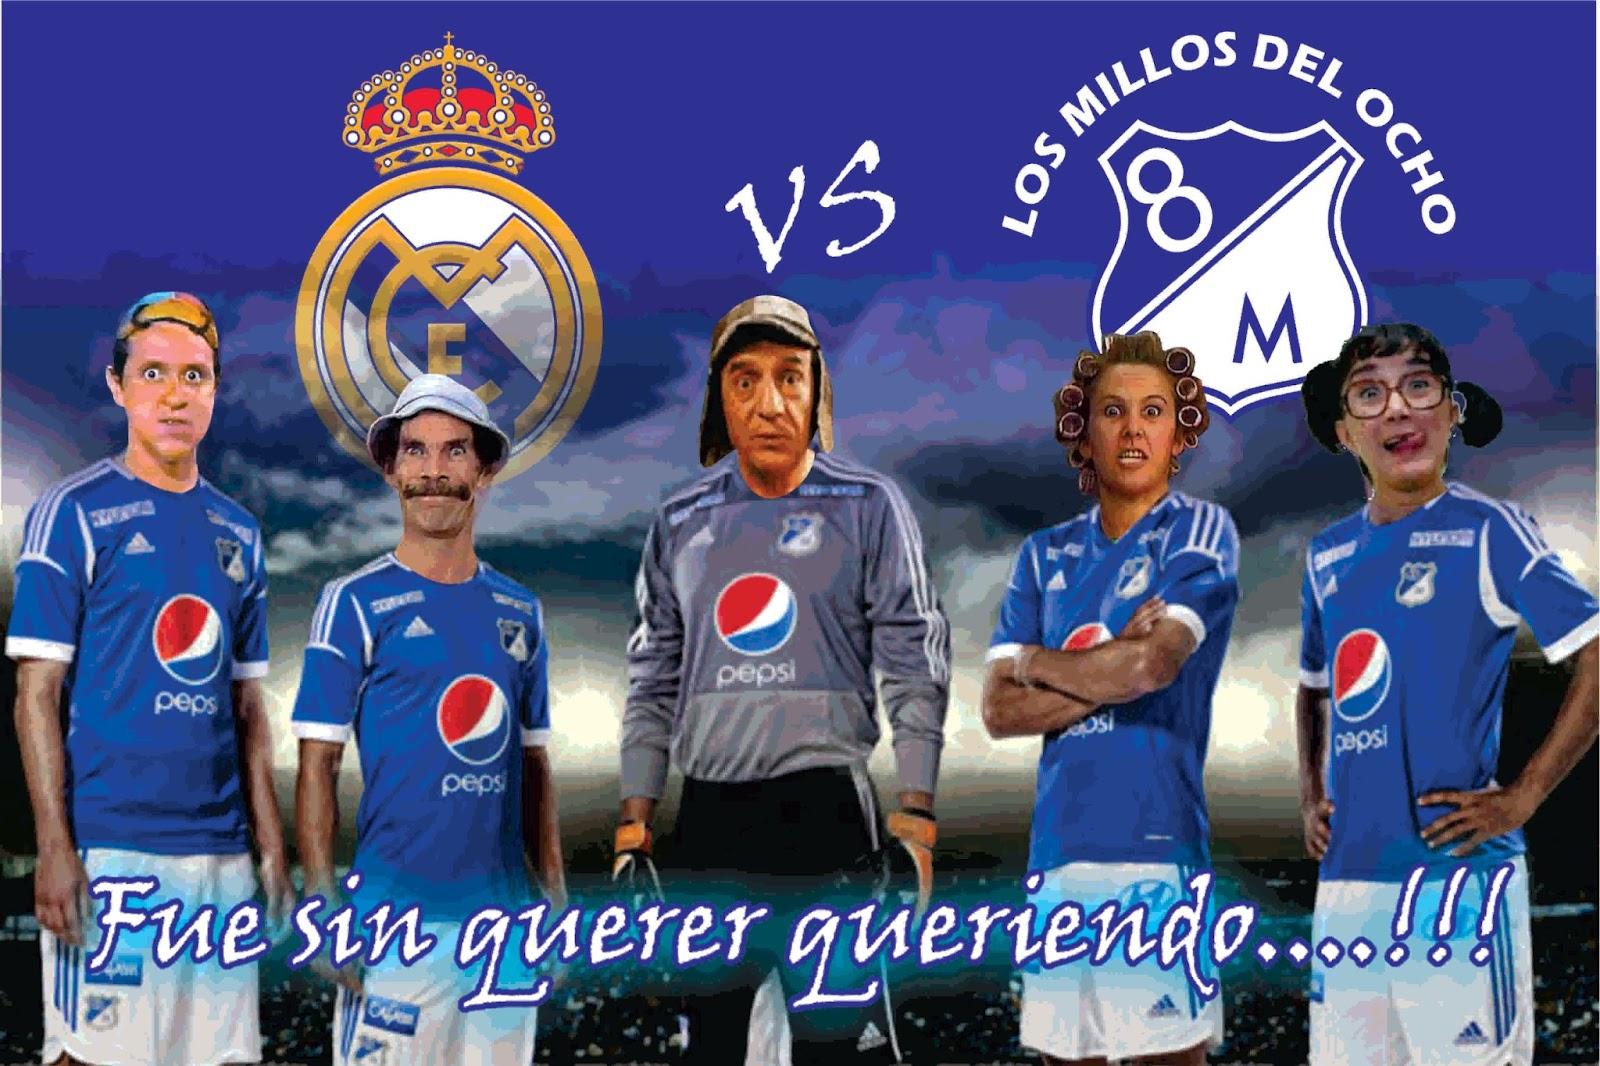 Real Madrid 8, Millonarios 0: los memes